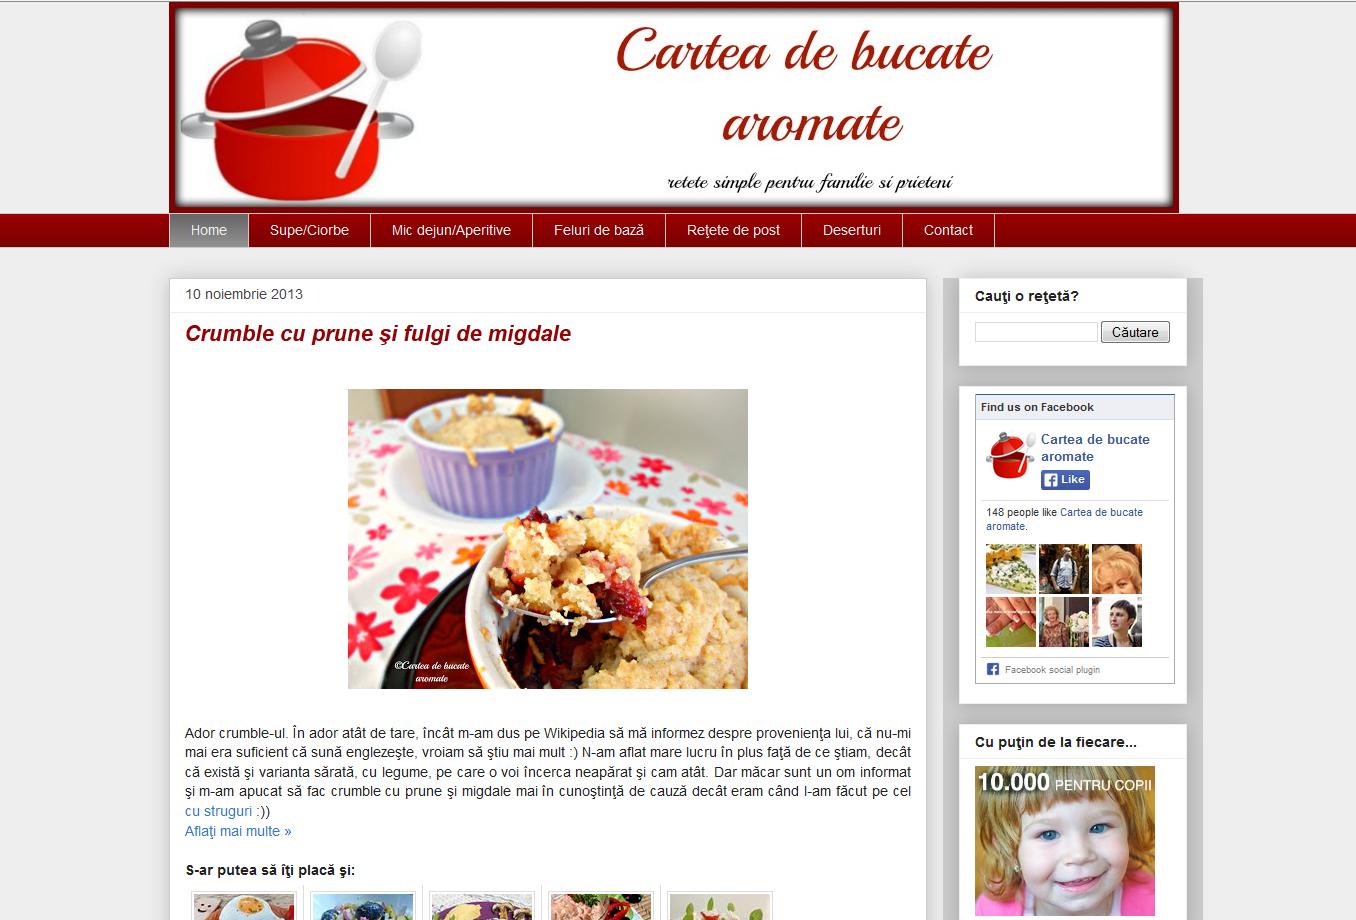 http://bucatearomate.blogspot.ro/